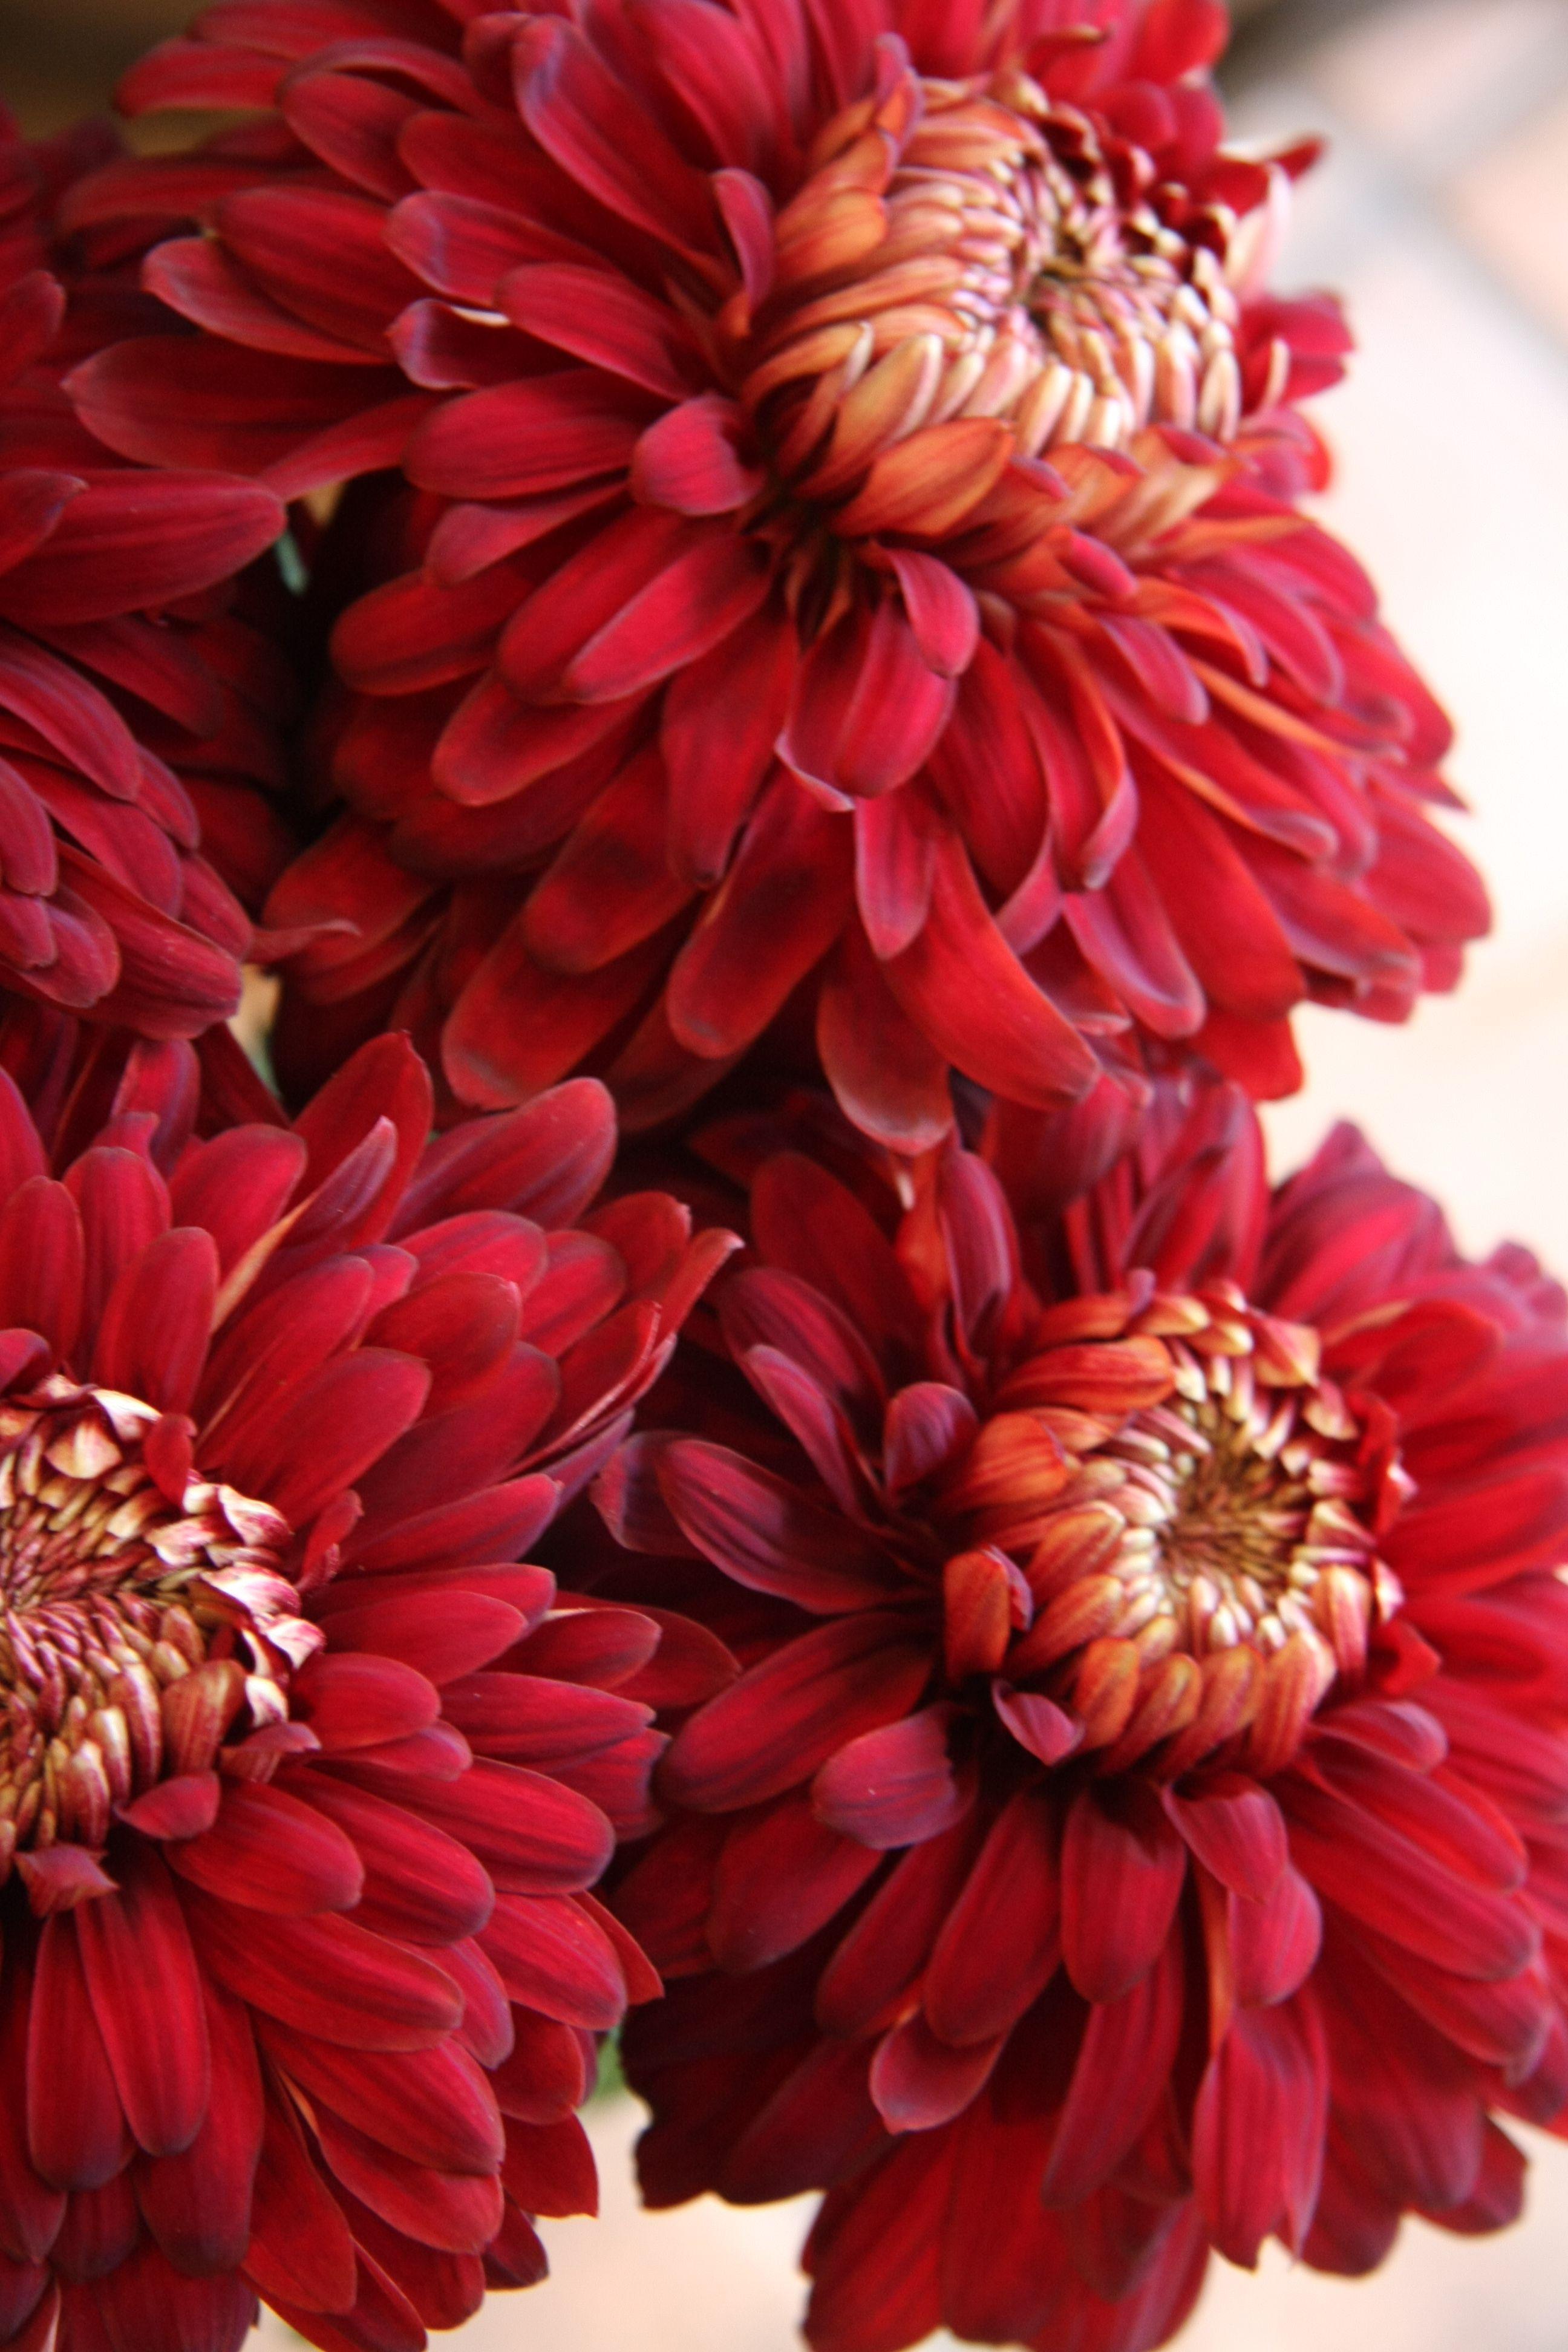 The Painted Bench Photo Red Chrysanthemums Chrysanthemum Beautiful Flowers